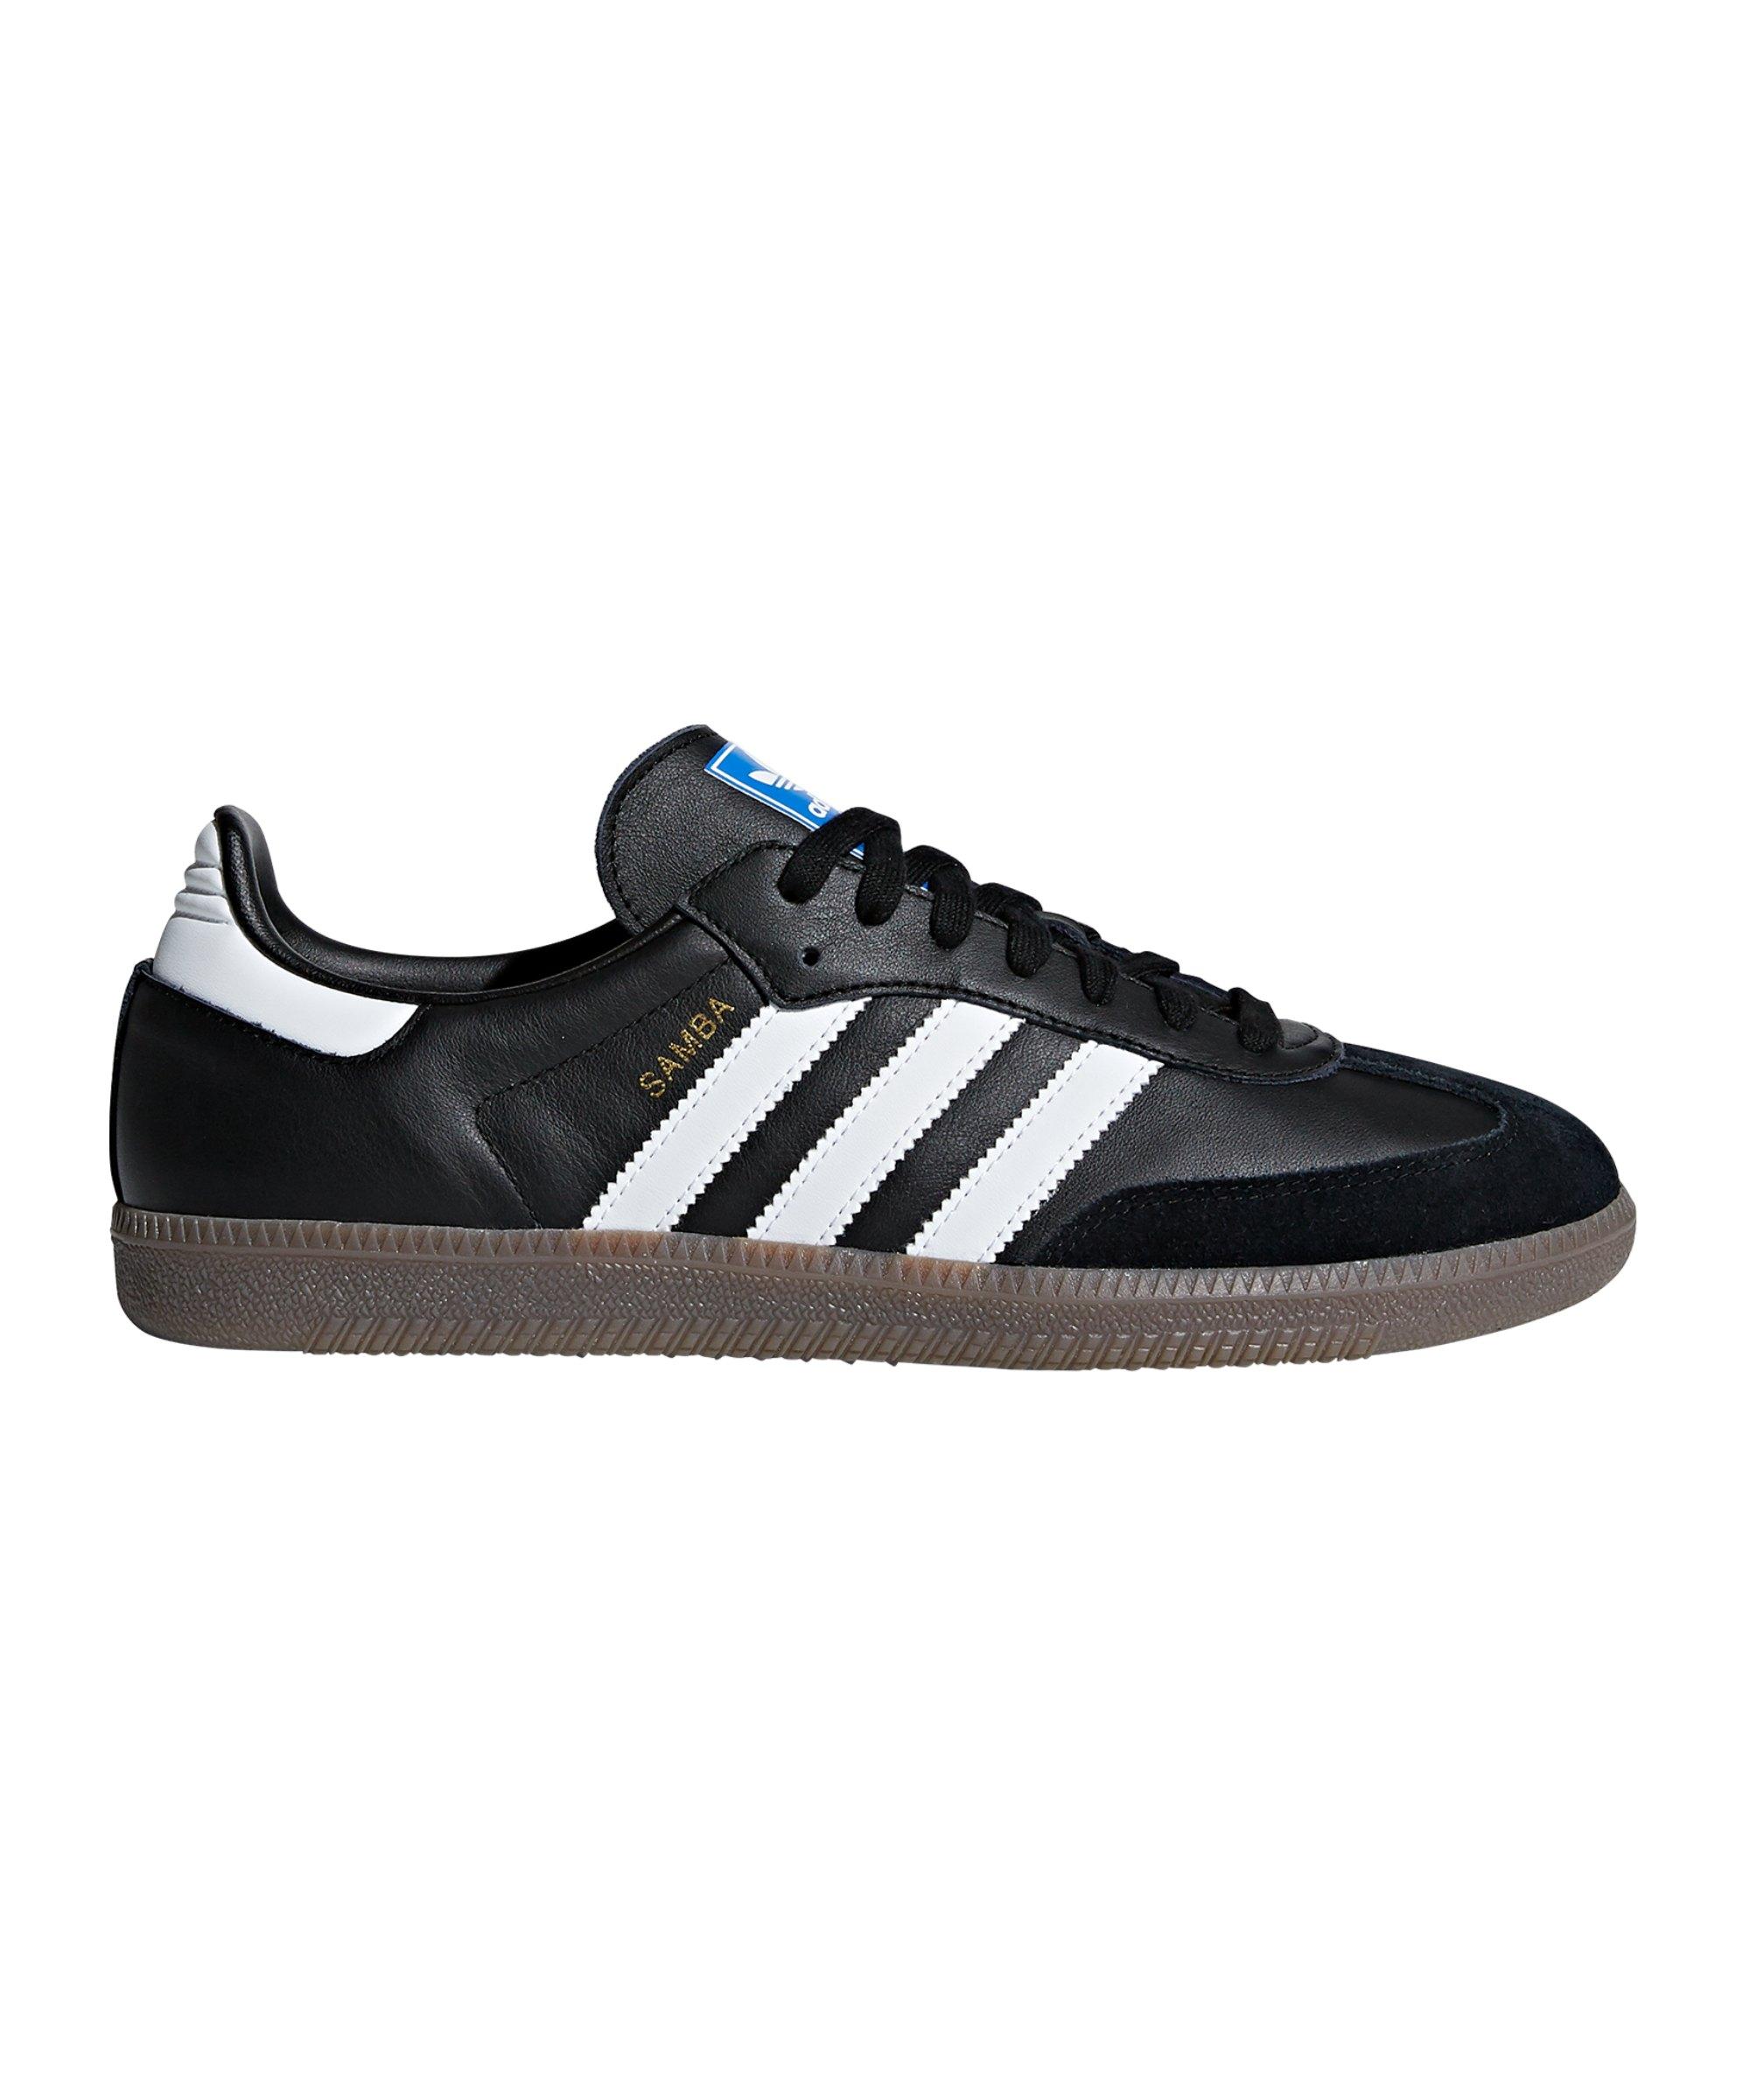 adidas Originals Samba OG Schwarz Weiss